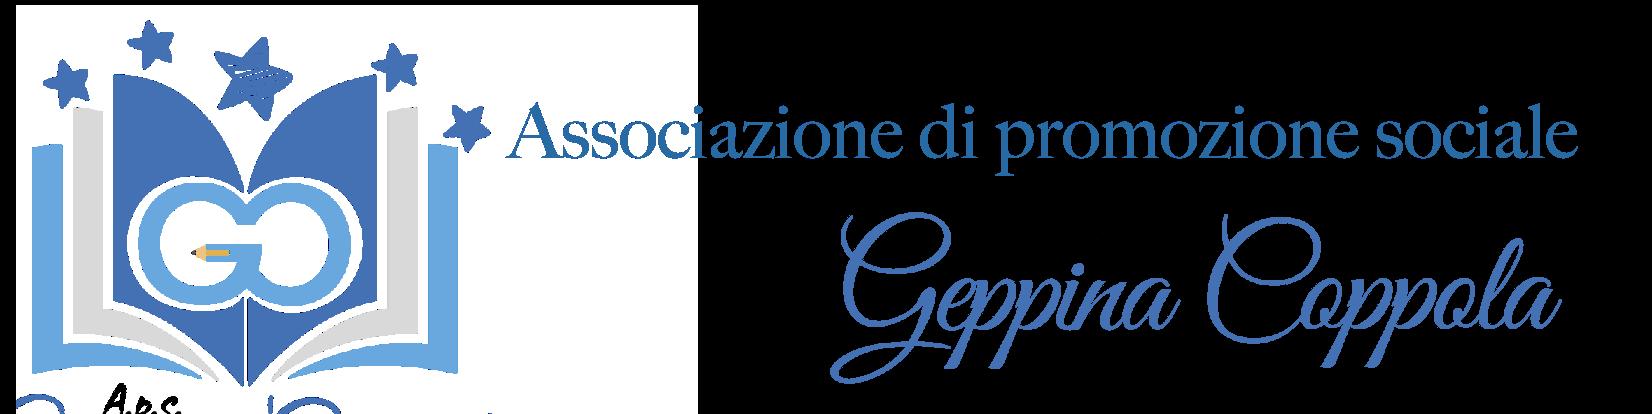 "Associazione di Promozione Sociale ""Geppina Coppola"""